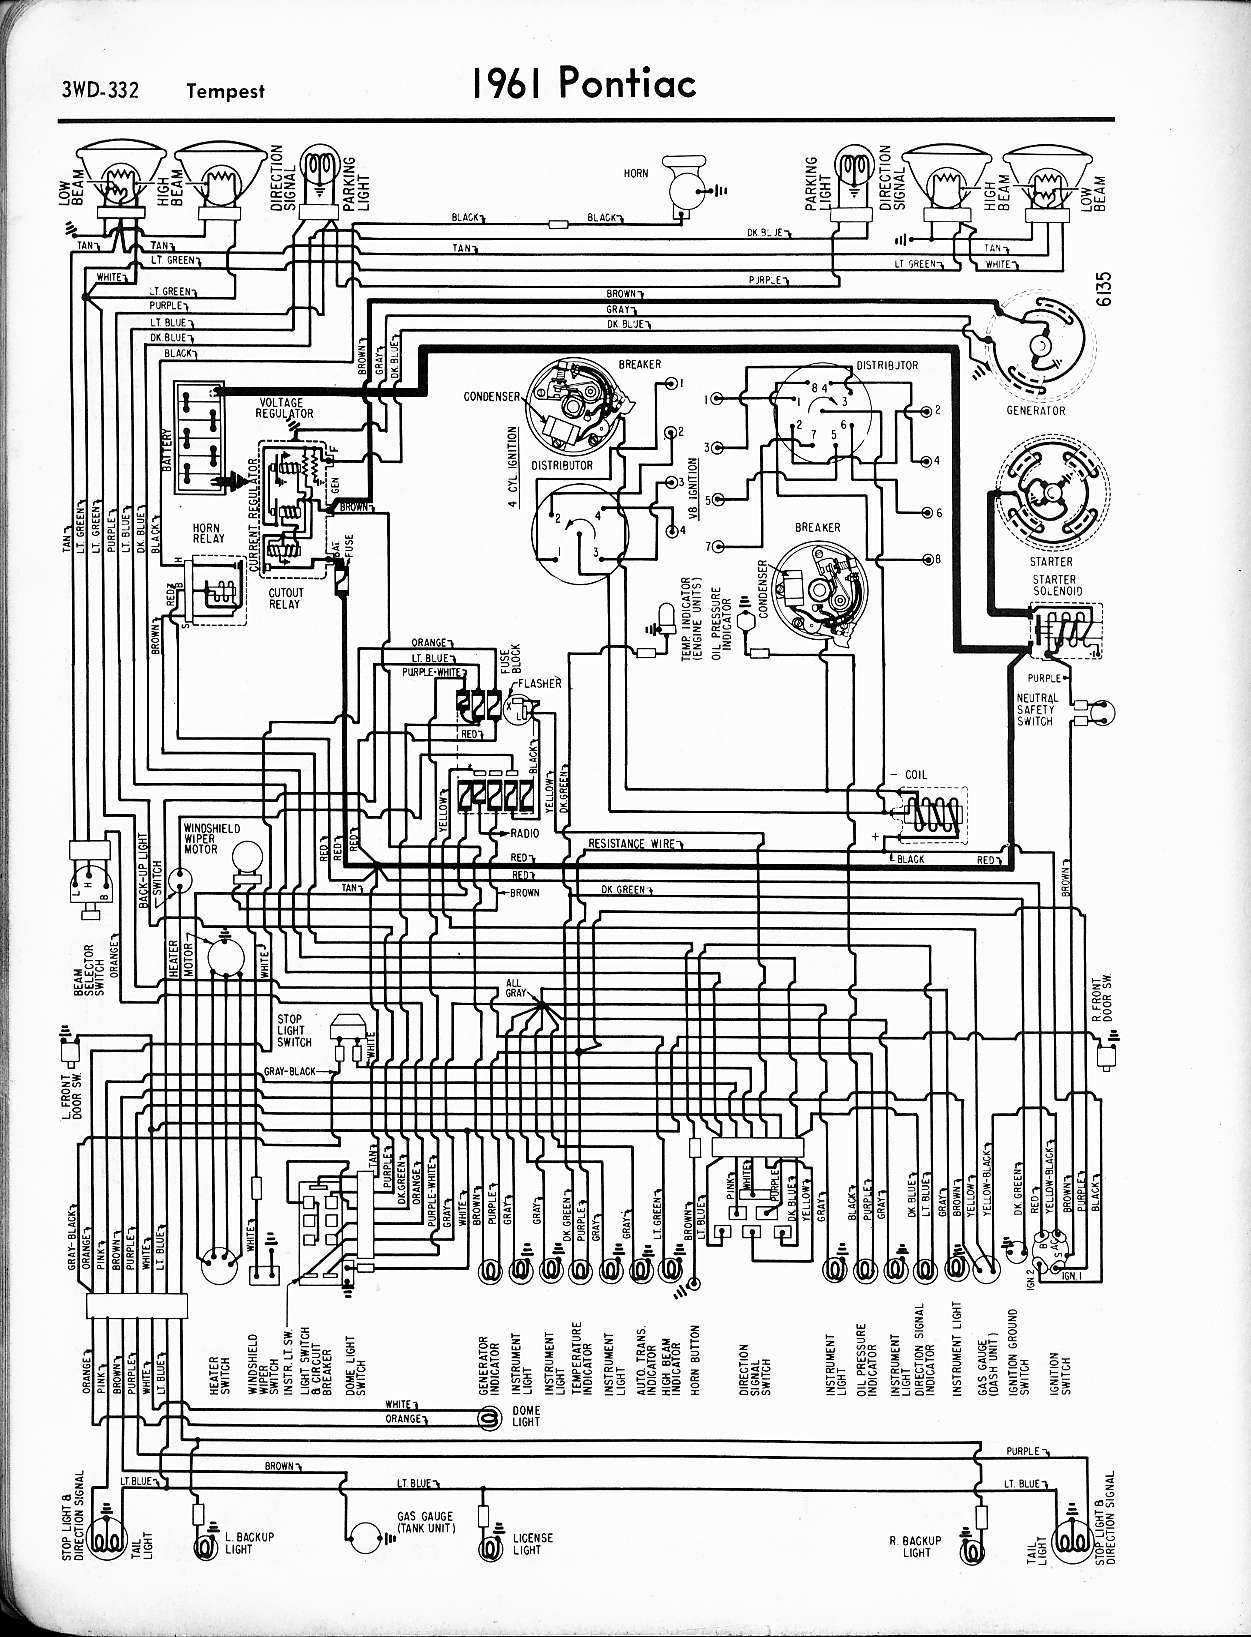 1965 Gto Tach Wiring Diagram Honda Accord 08 Fuse Box Fiats128 Cheerokee Jeanjaures37 Fr